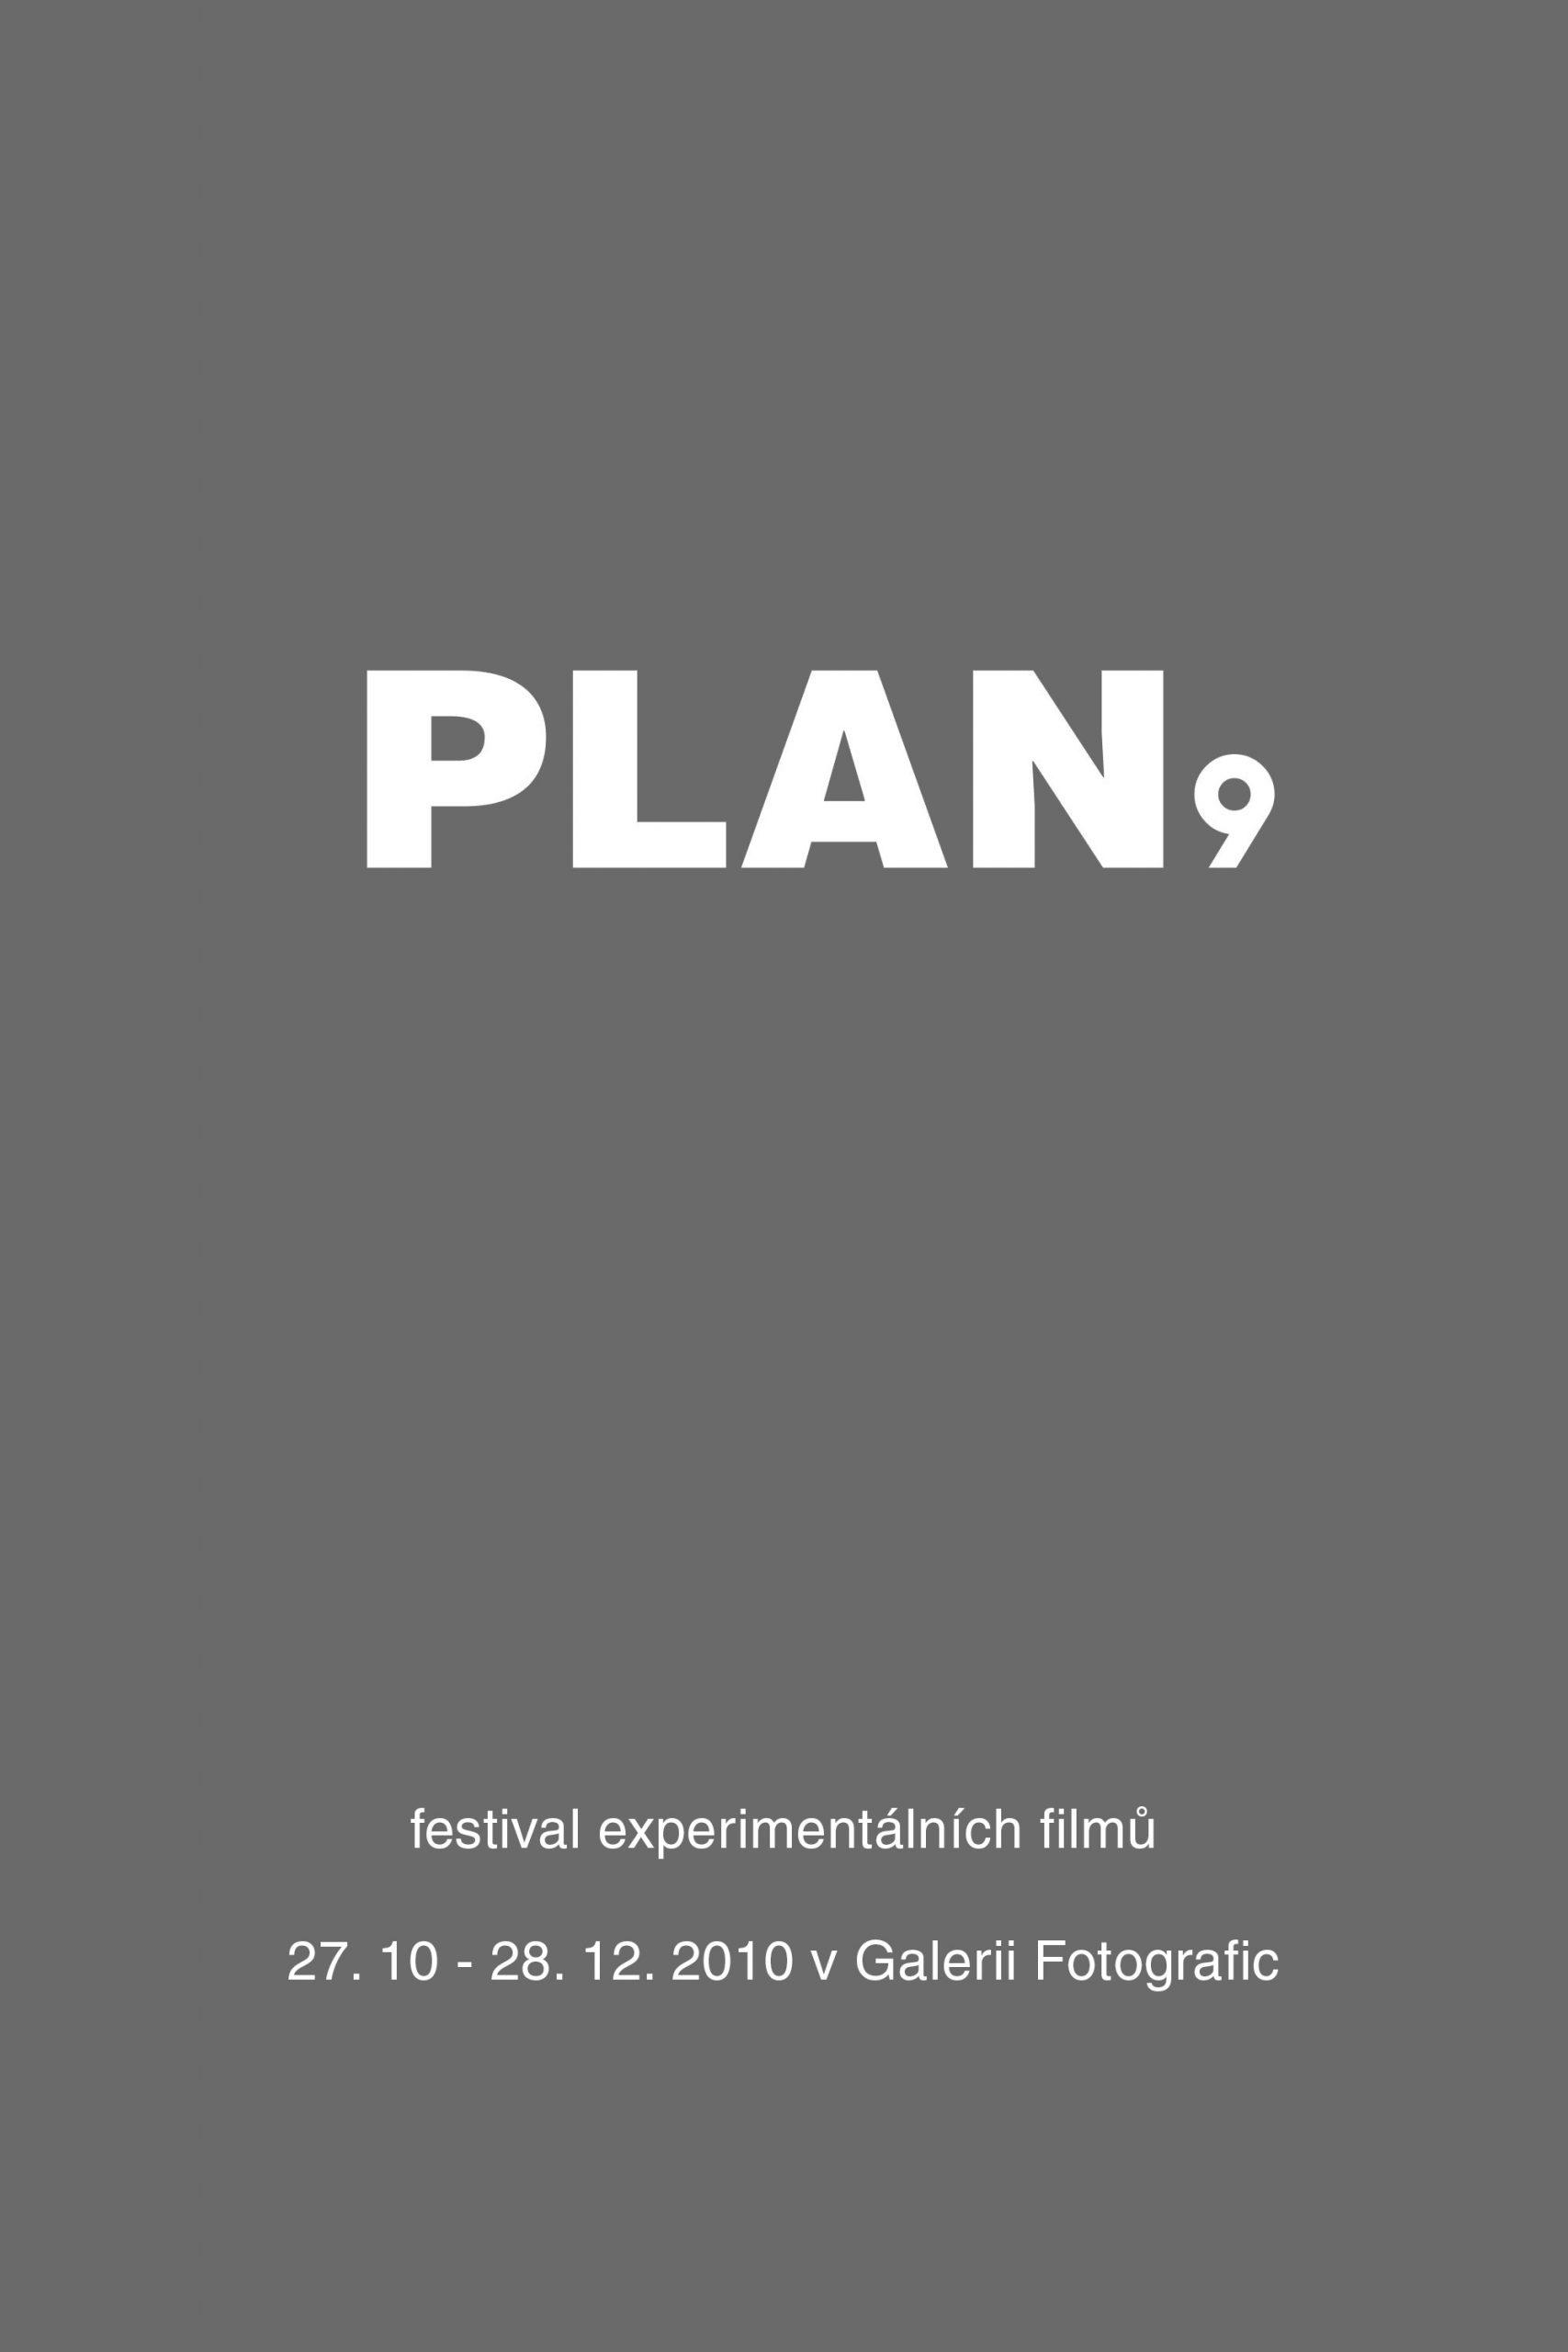 PLAN 9 2010 film festival at Fotografic - poster